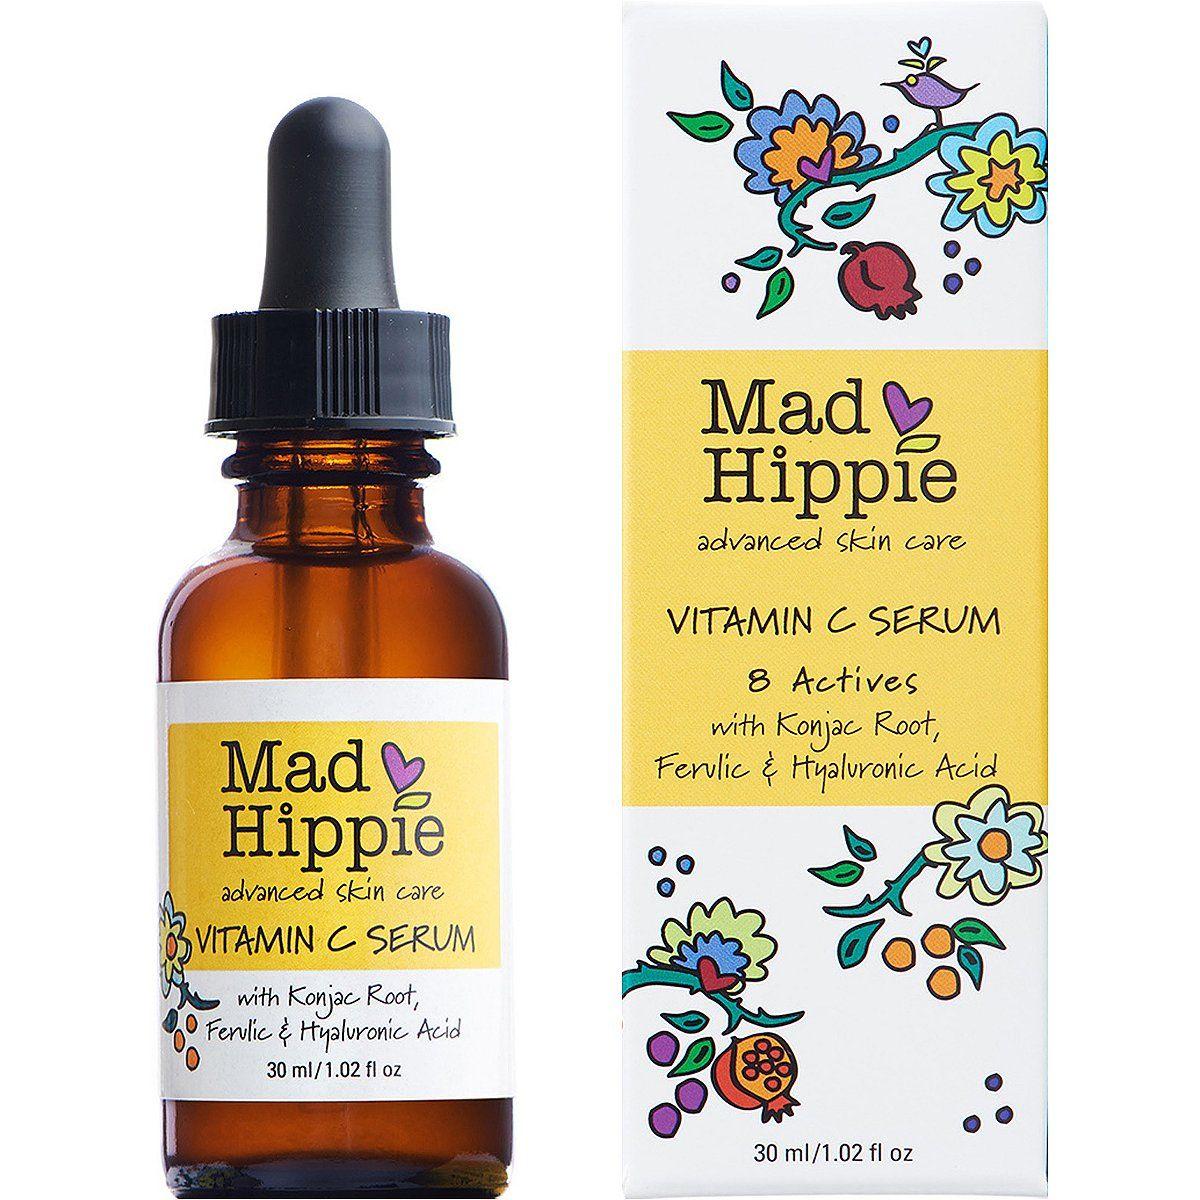 Mad Hippie Vitamin C Serum Ulta Beauty Mad Hippie Vitamin C Serum Vitamins